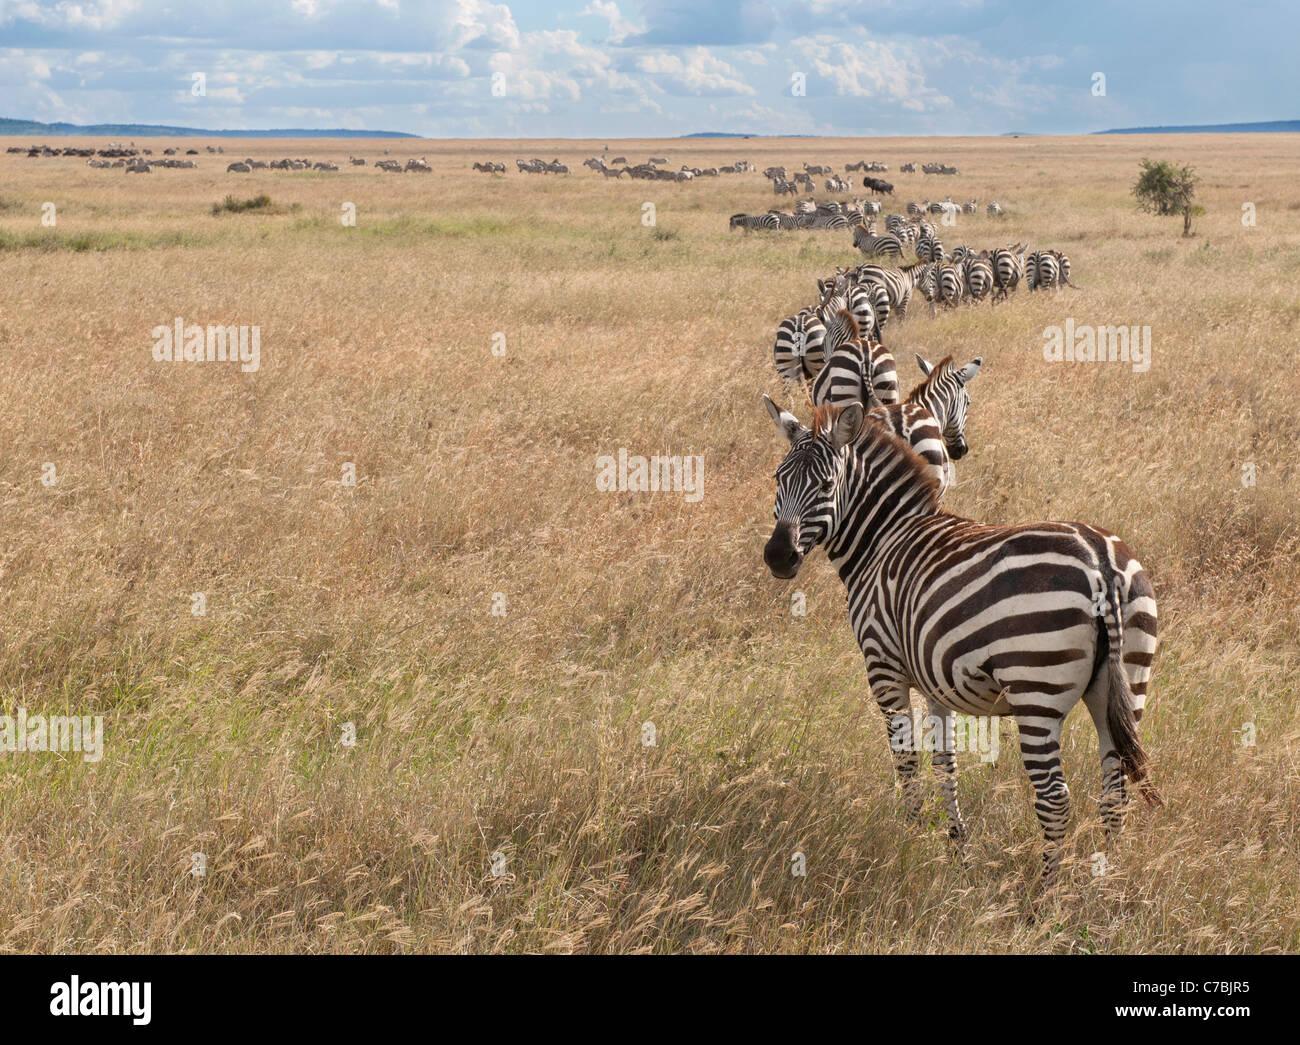 Zebras at the Serengeti National Park, Tanzania, Africa - Stock Image